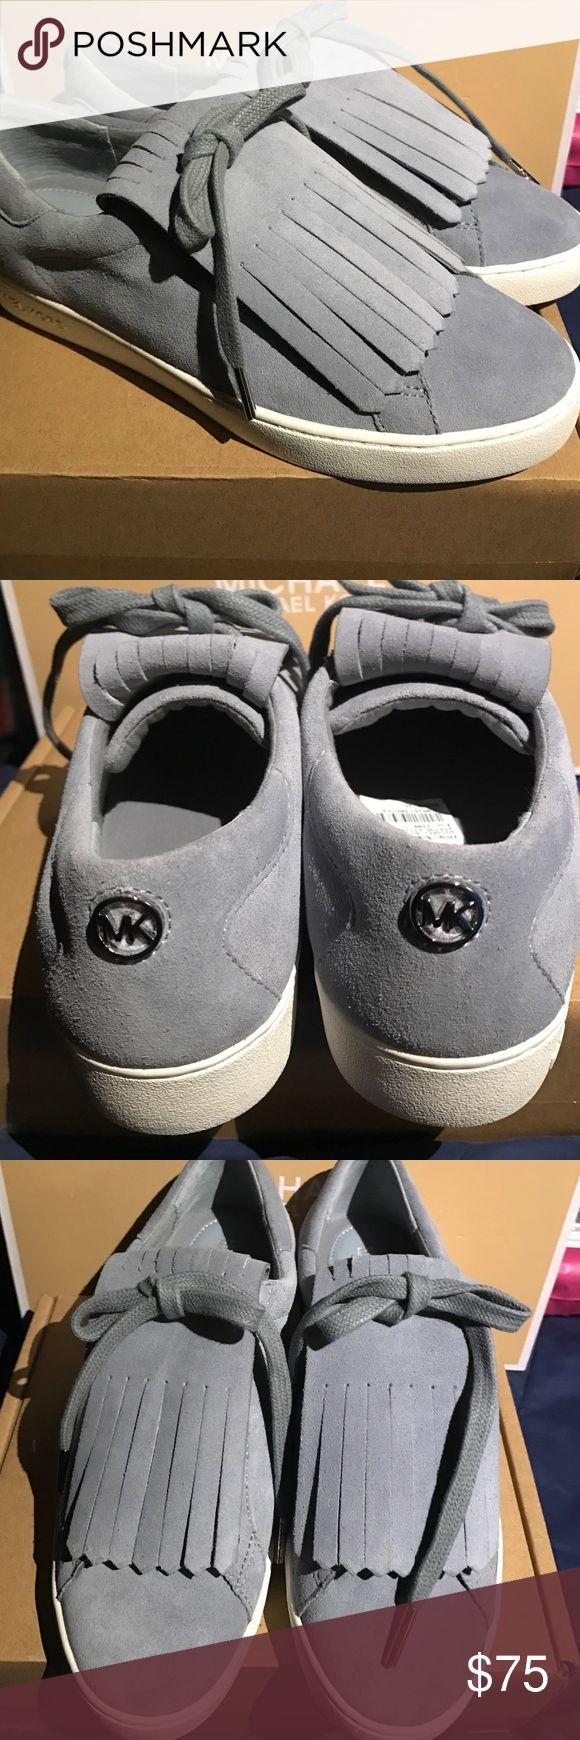 new michael kors sneakers new michael kors keaton kiltie sneaker suede. Black Bedroom Furniture Sets. Home Design Ideas